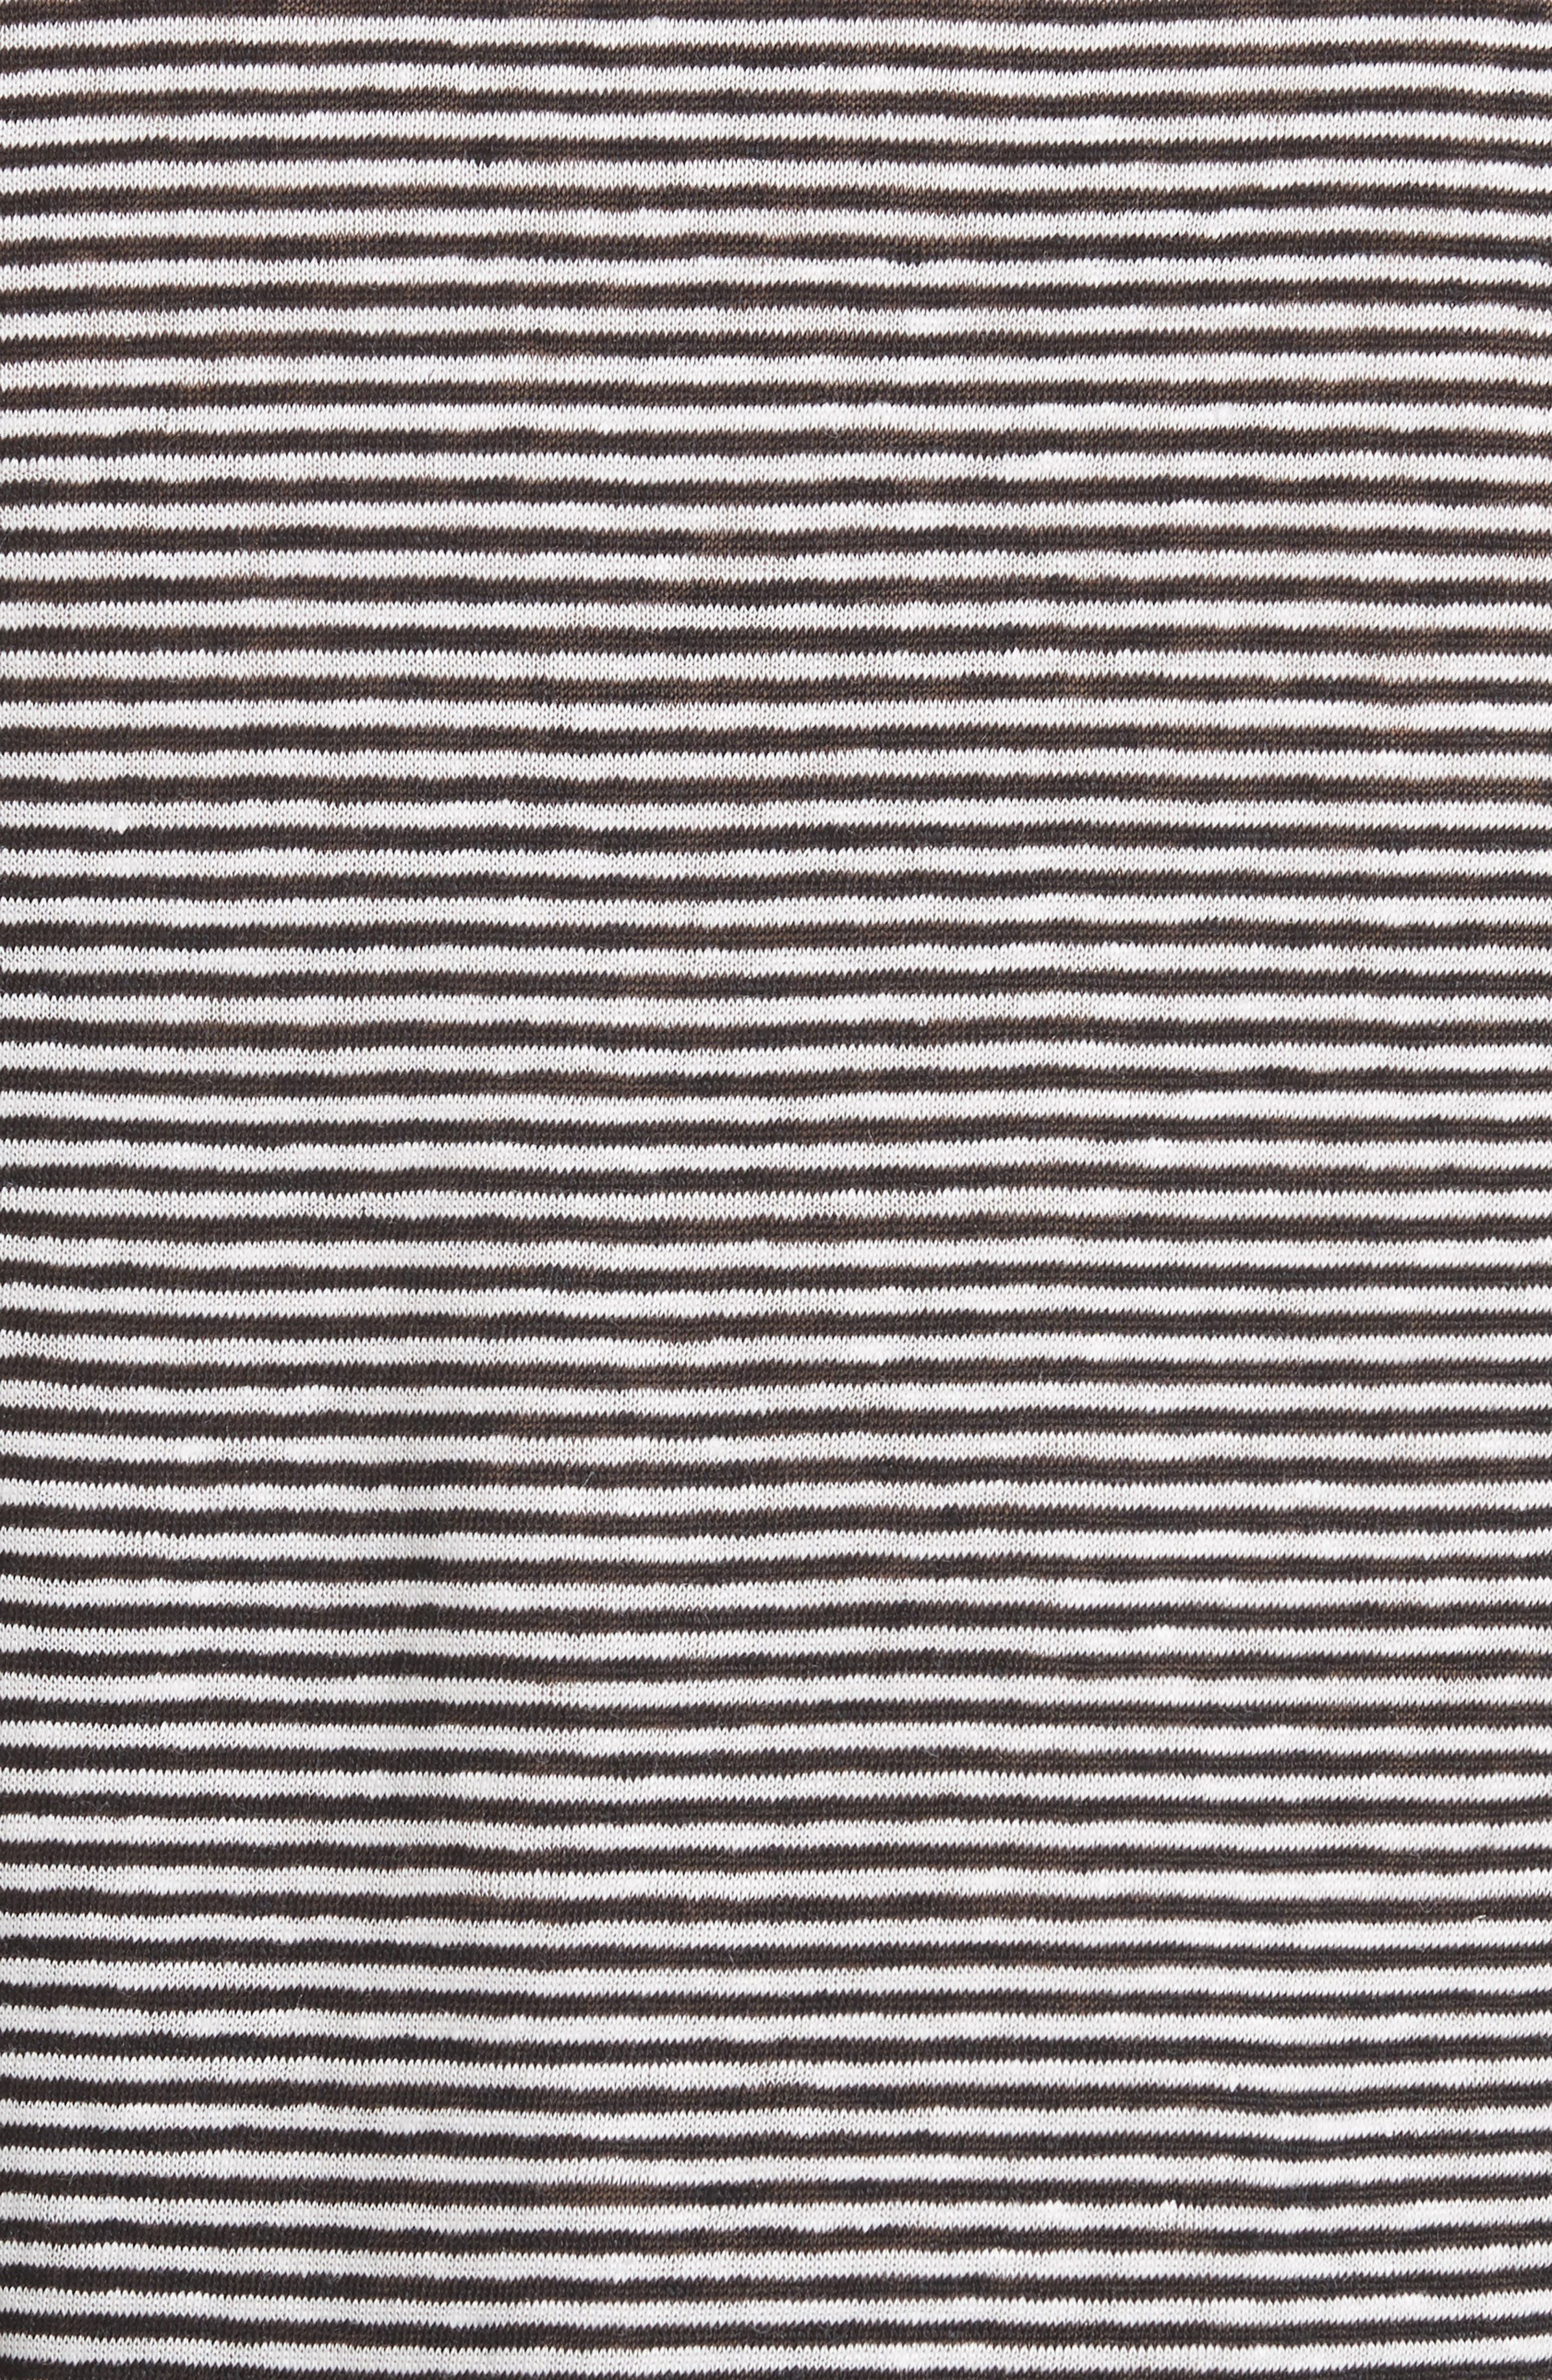 Ines Stripe Linen Crop Tee,                             Alternate thumbnail 5, color,                             BLACK/ WHITE